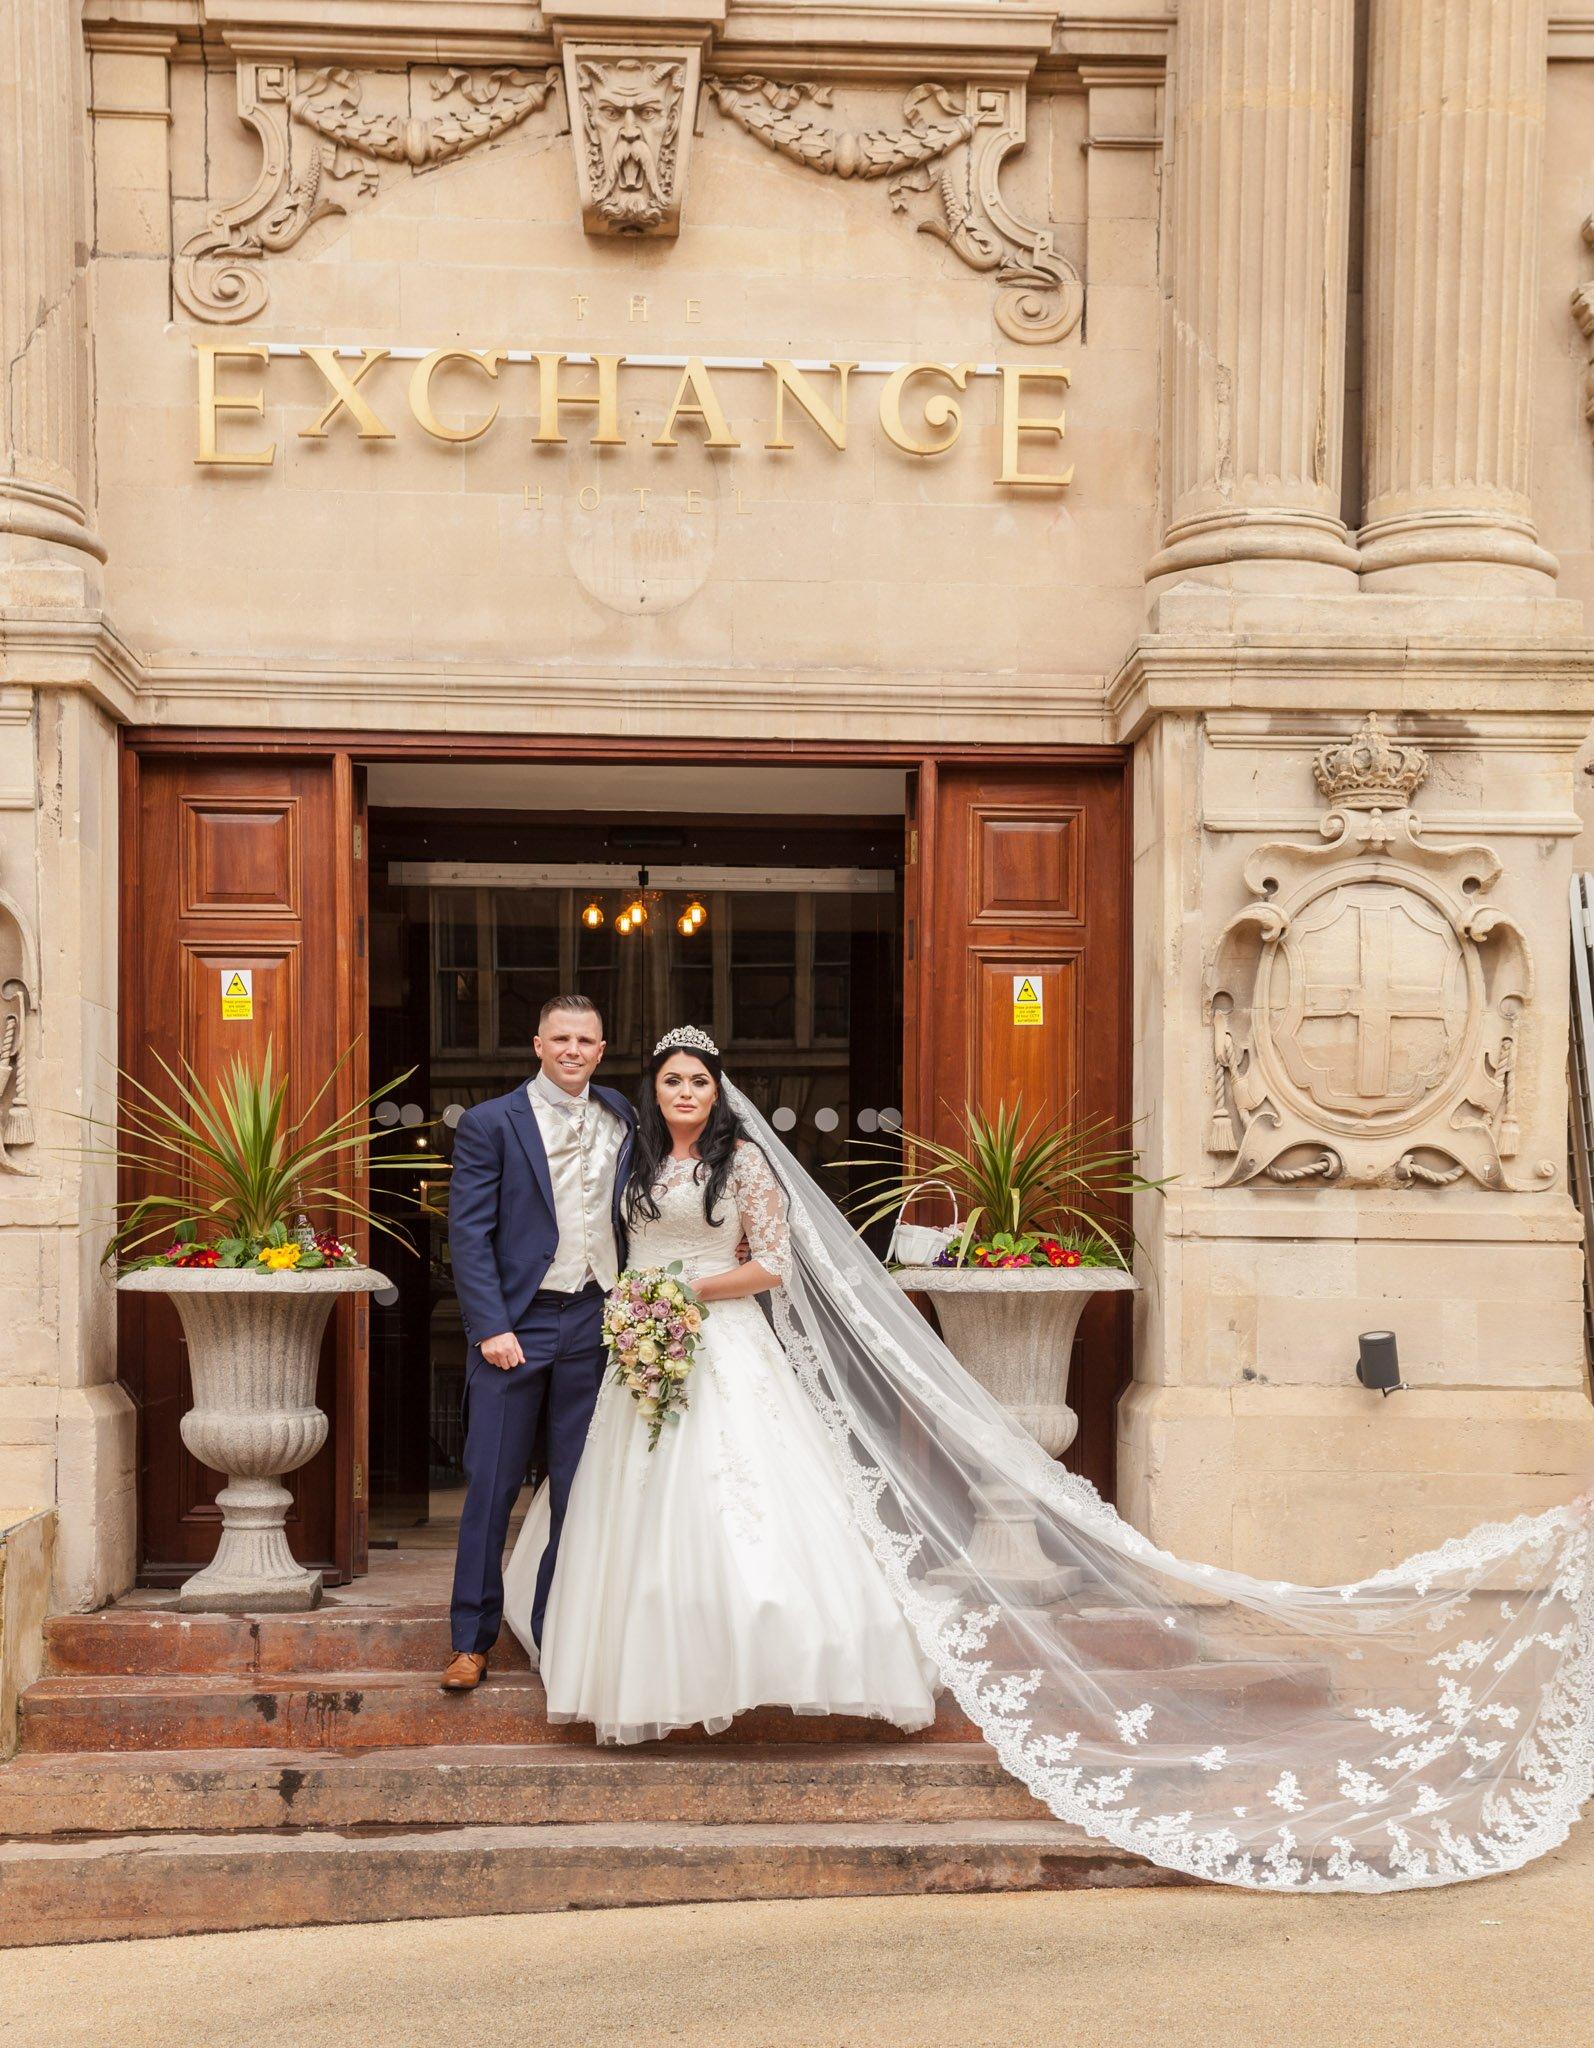 Wedding of Lena & Mark at The Exchange Hotel Cardiff, Tania Miller Photography, Cardiff Wedding Photographer